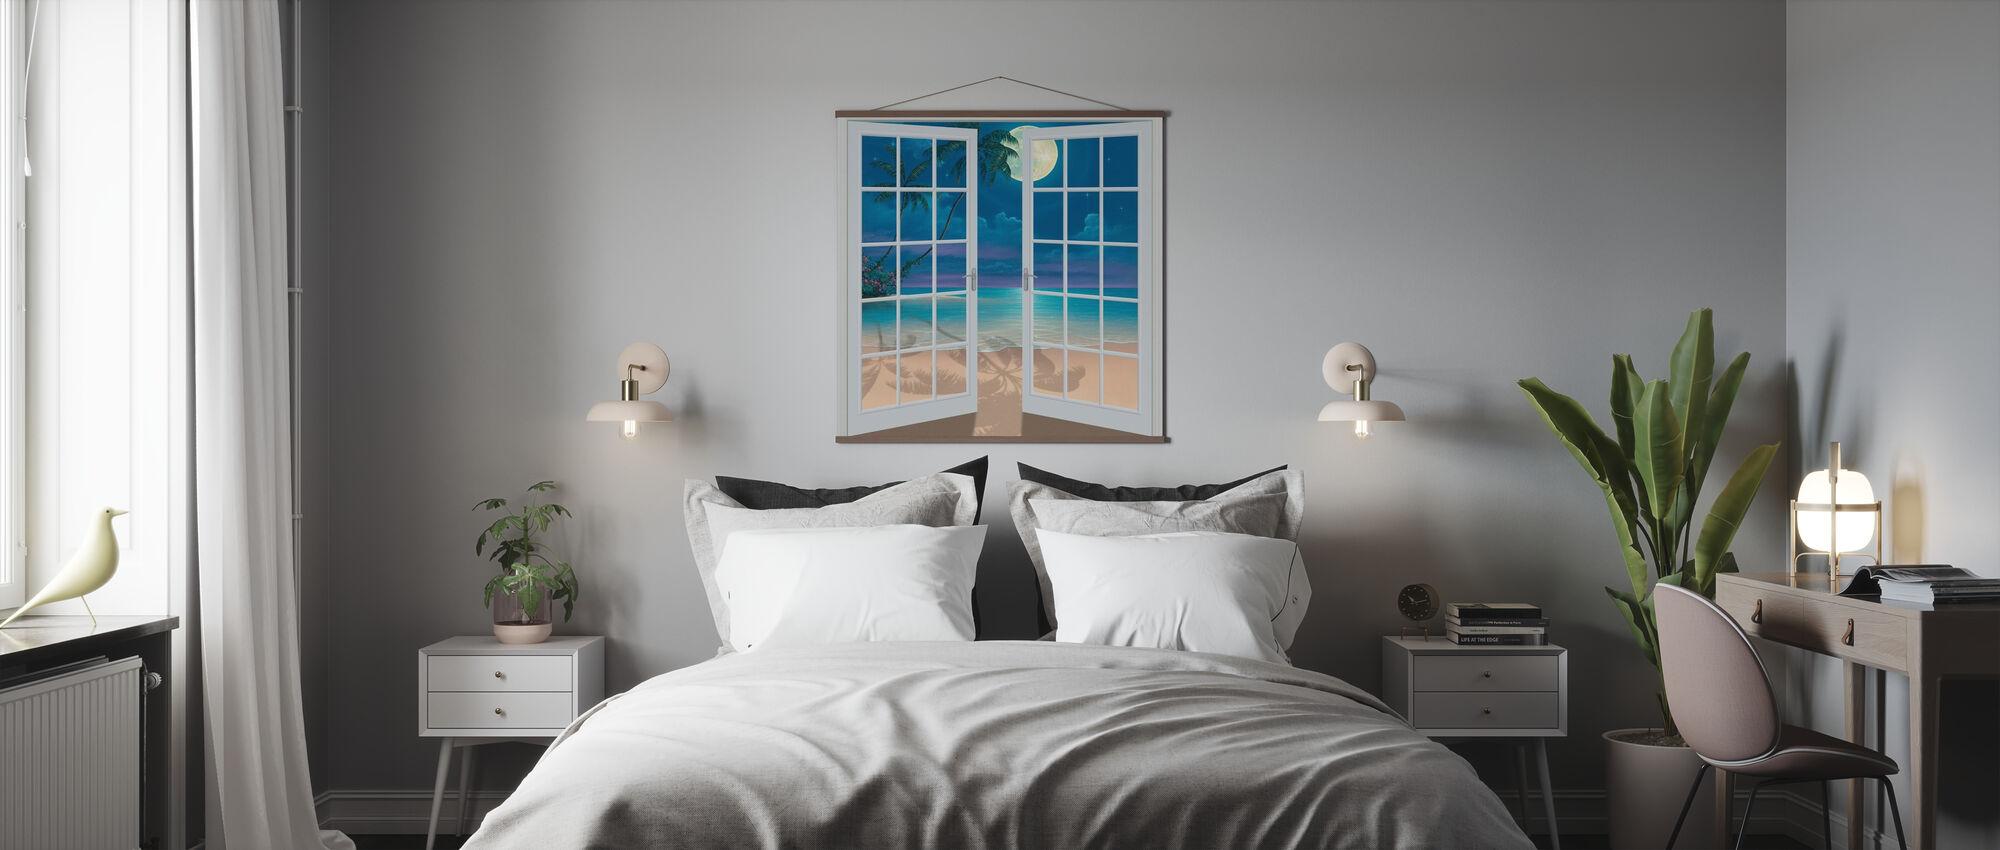 Moon Shadows - Poster - Bedroom